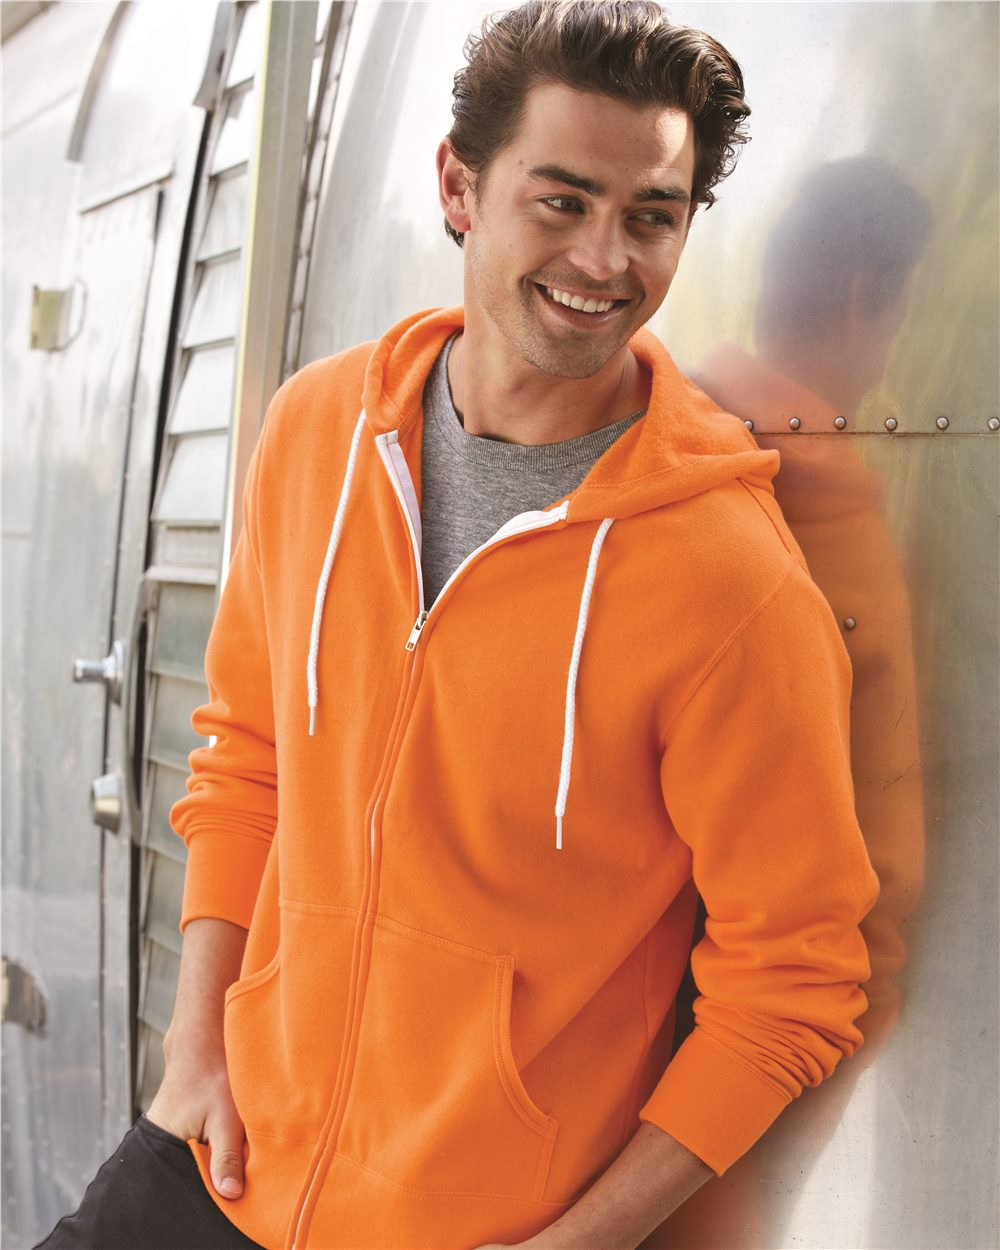 Independent Trading Co. AFX90UNZ Unisex Full-Zip Hooded Sweatshirt